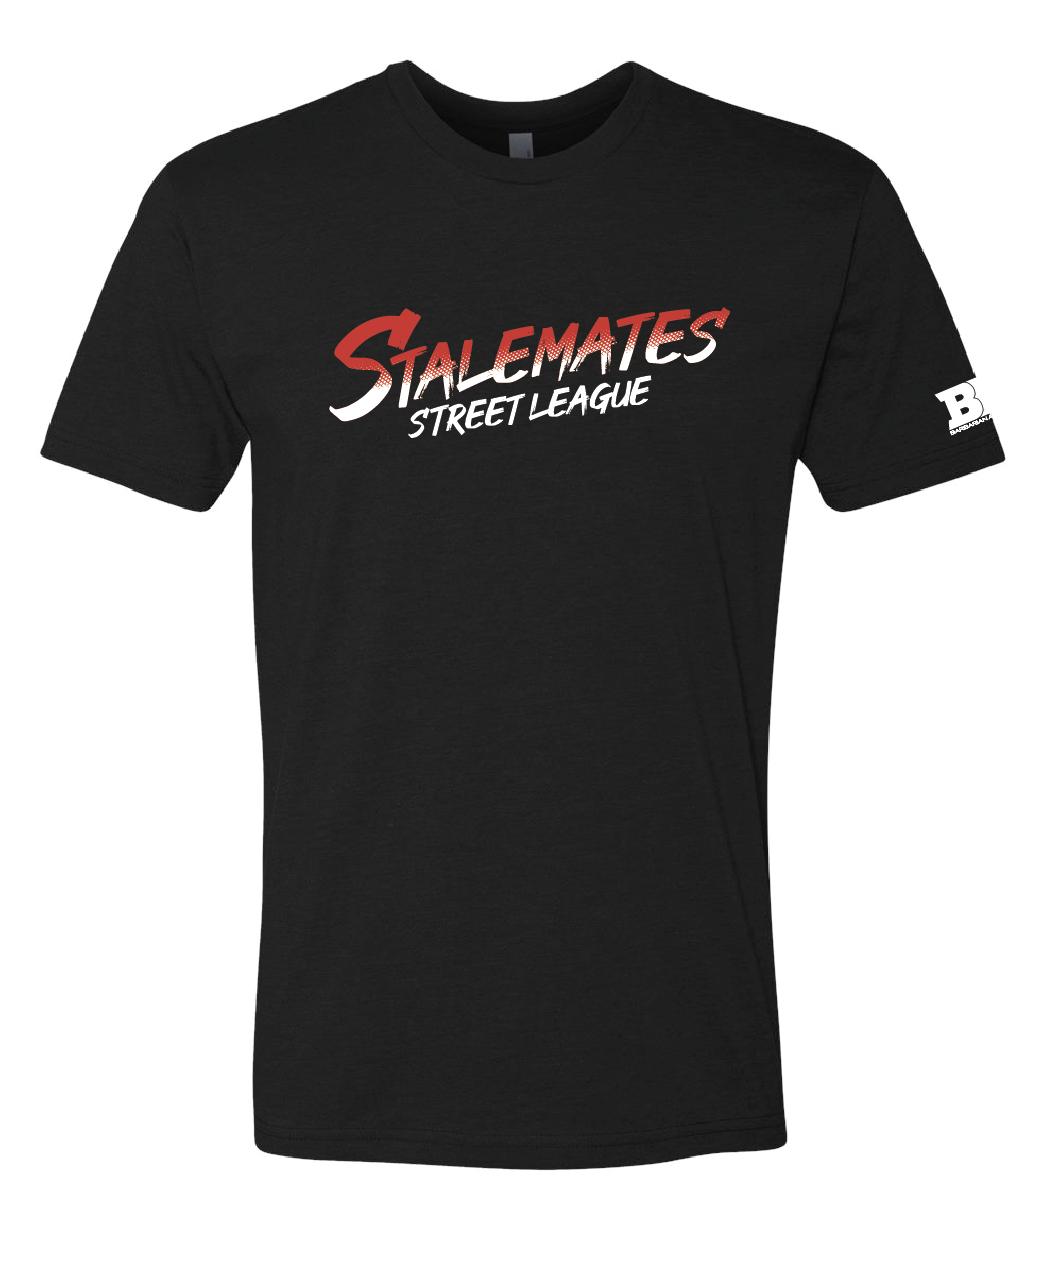 Stalemates Street League Shirt